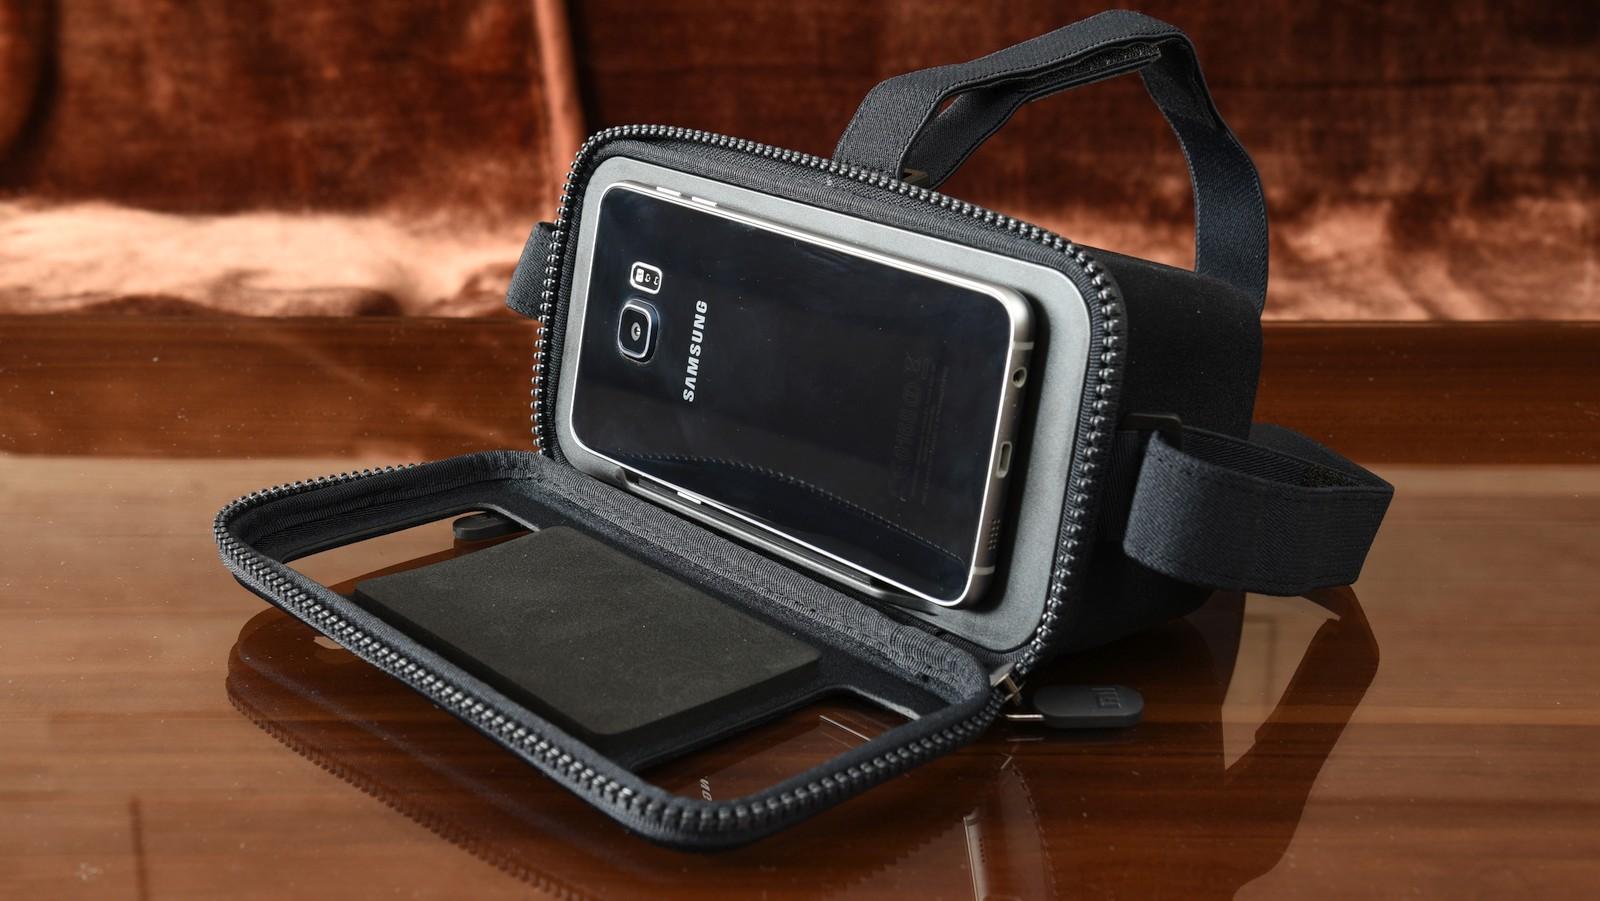 6d6d2ab5c Okuliare OnePlus Loop VR a Xiaomi VR - virtuálna realita do 30 eur Zdroj:  www.fony.sk